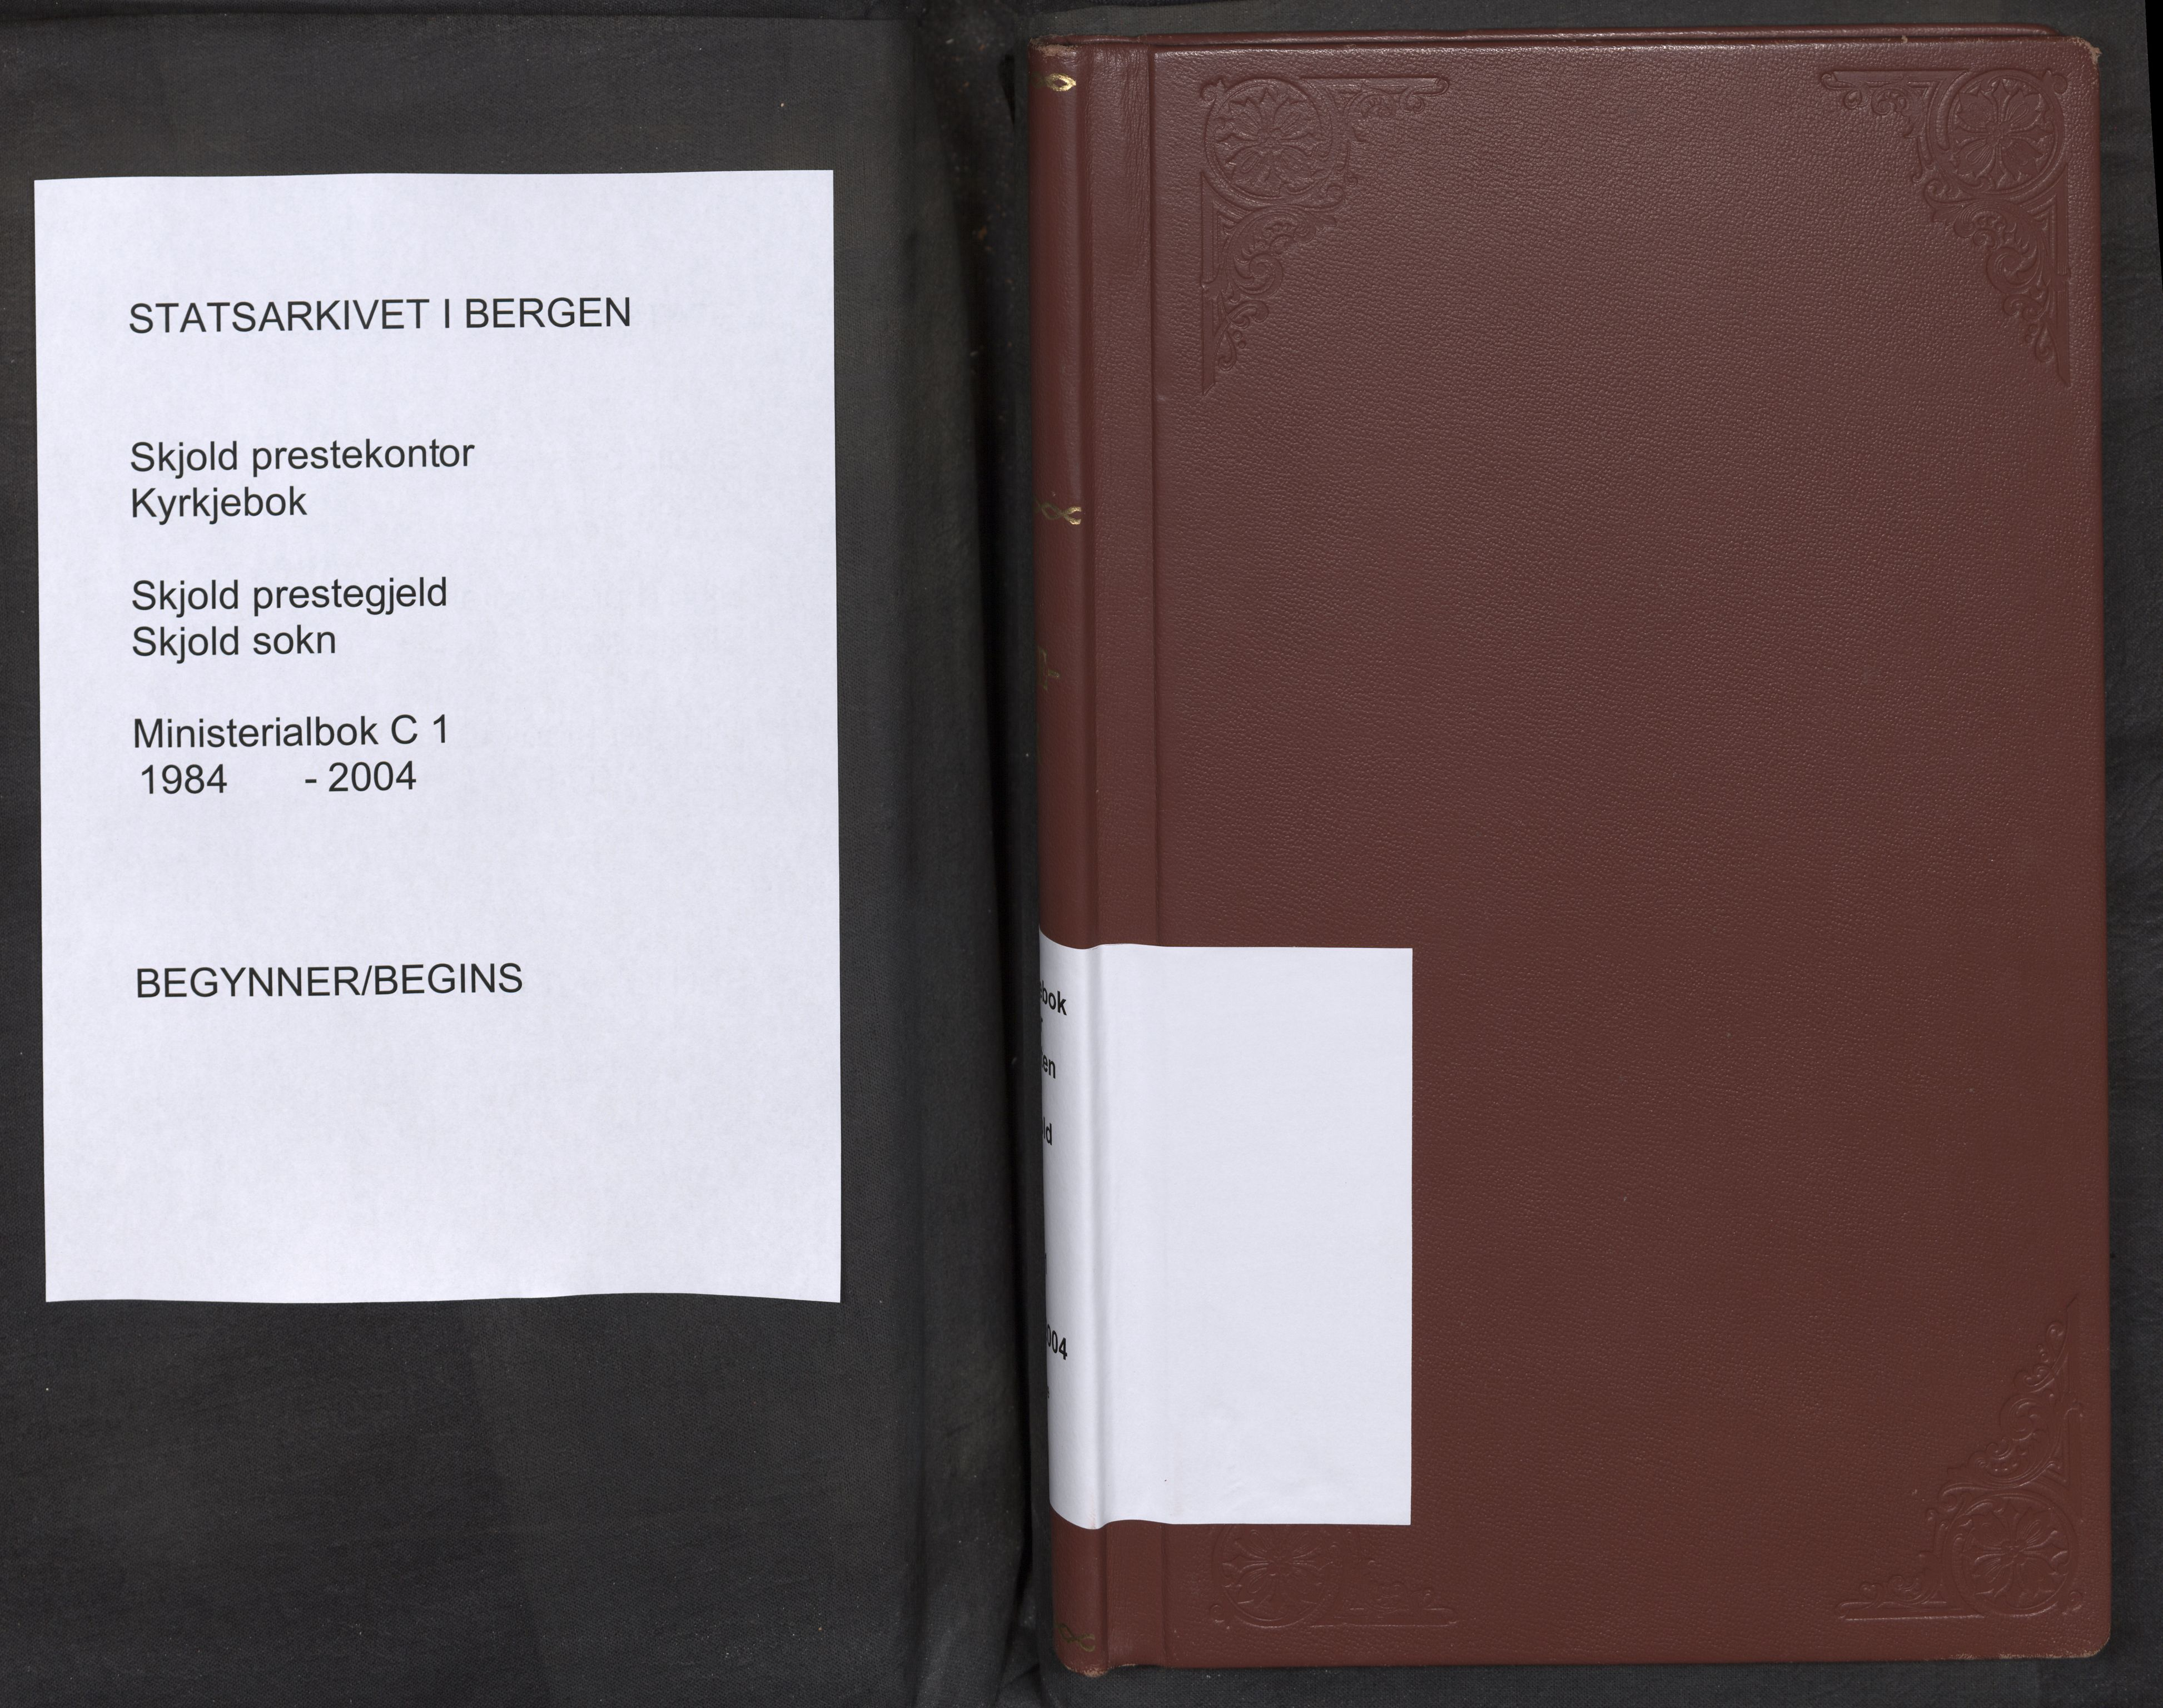 SAB, Nordås sokneprestembete, Parish register (official) no. C 1, 1984-2004